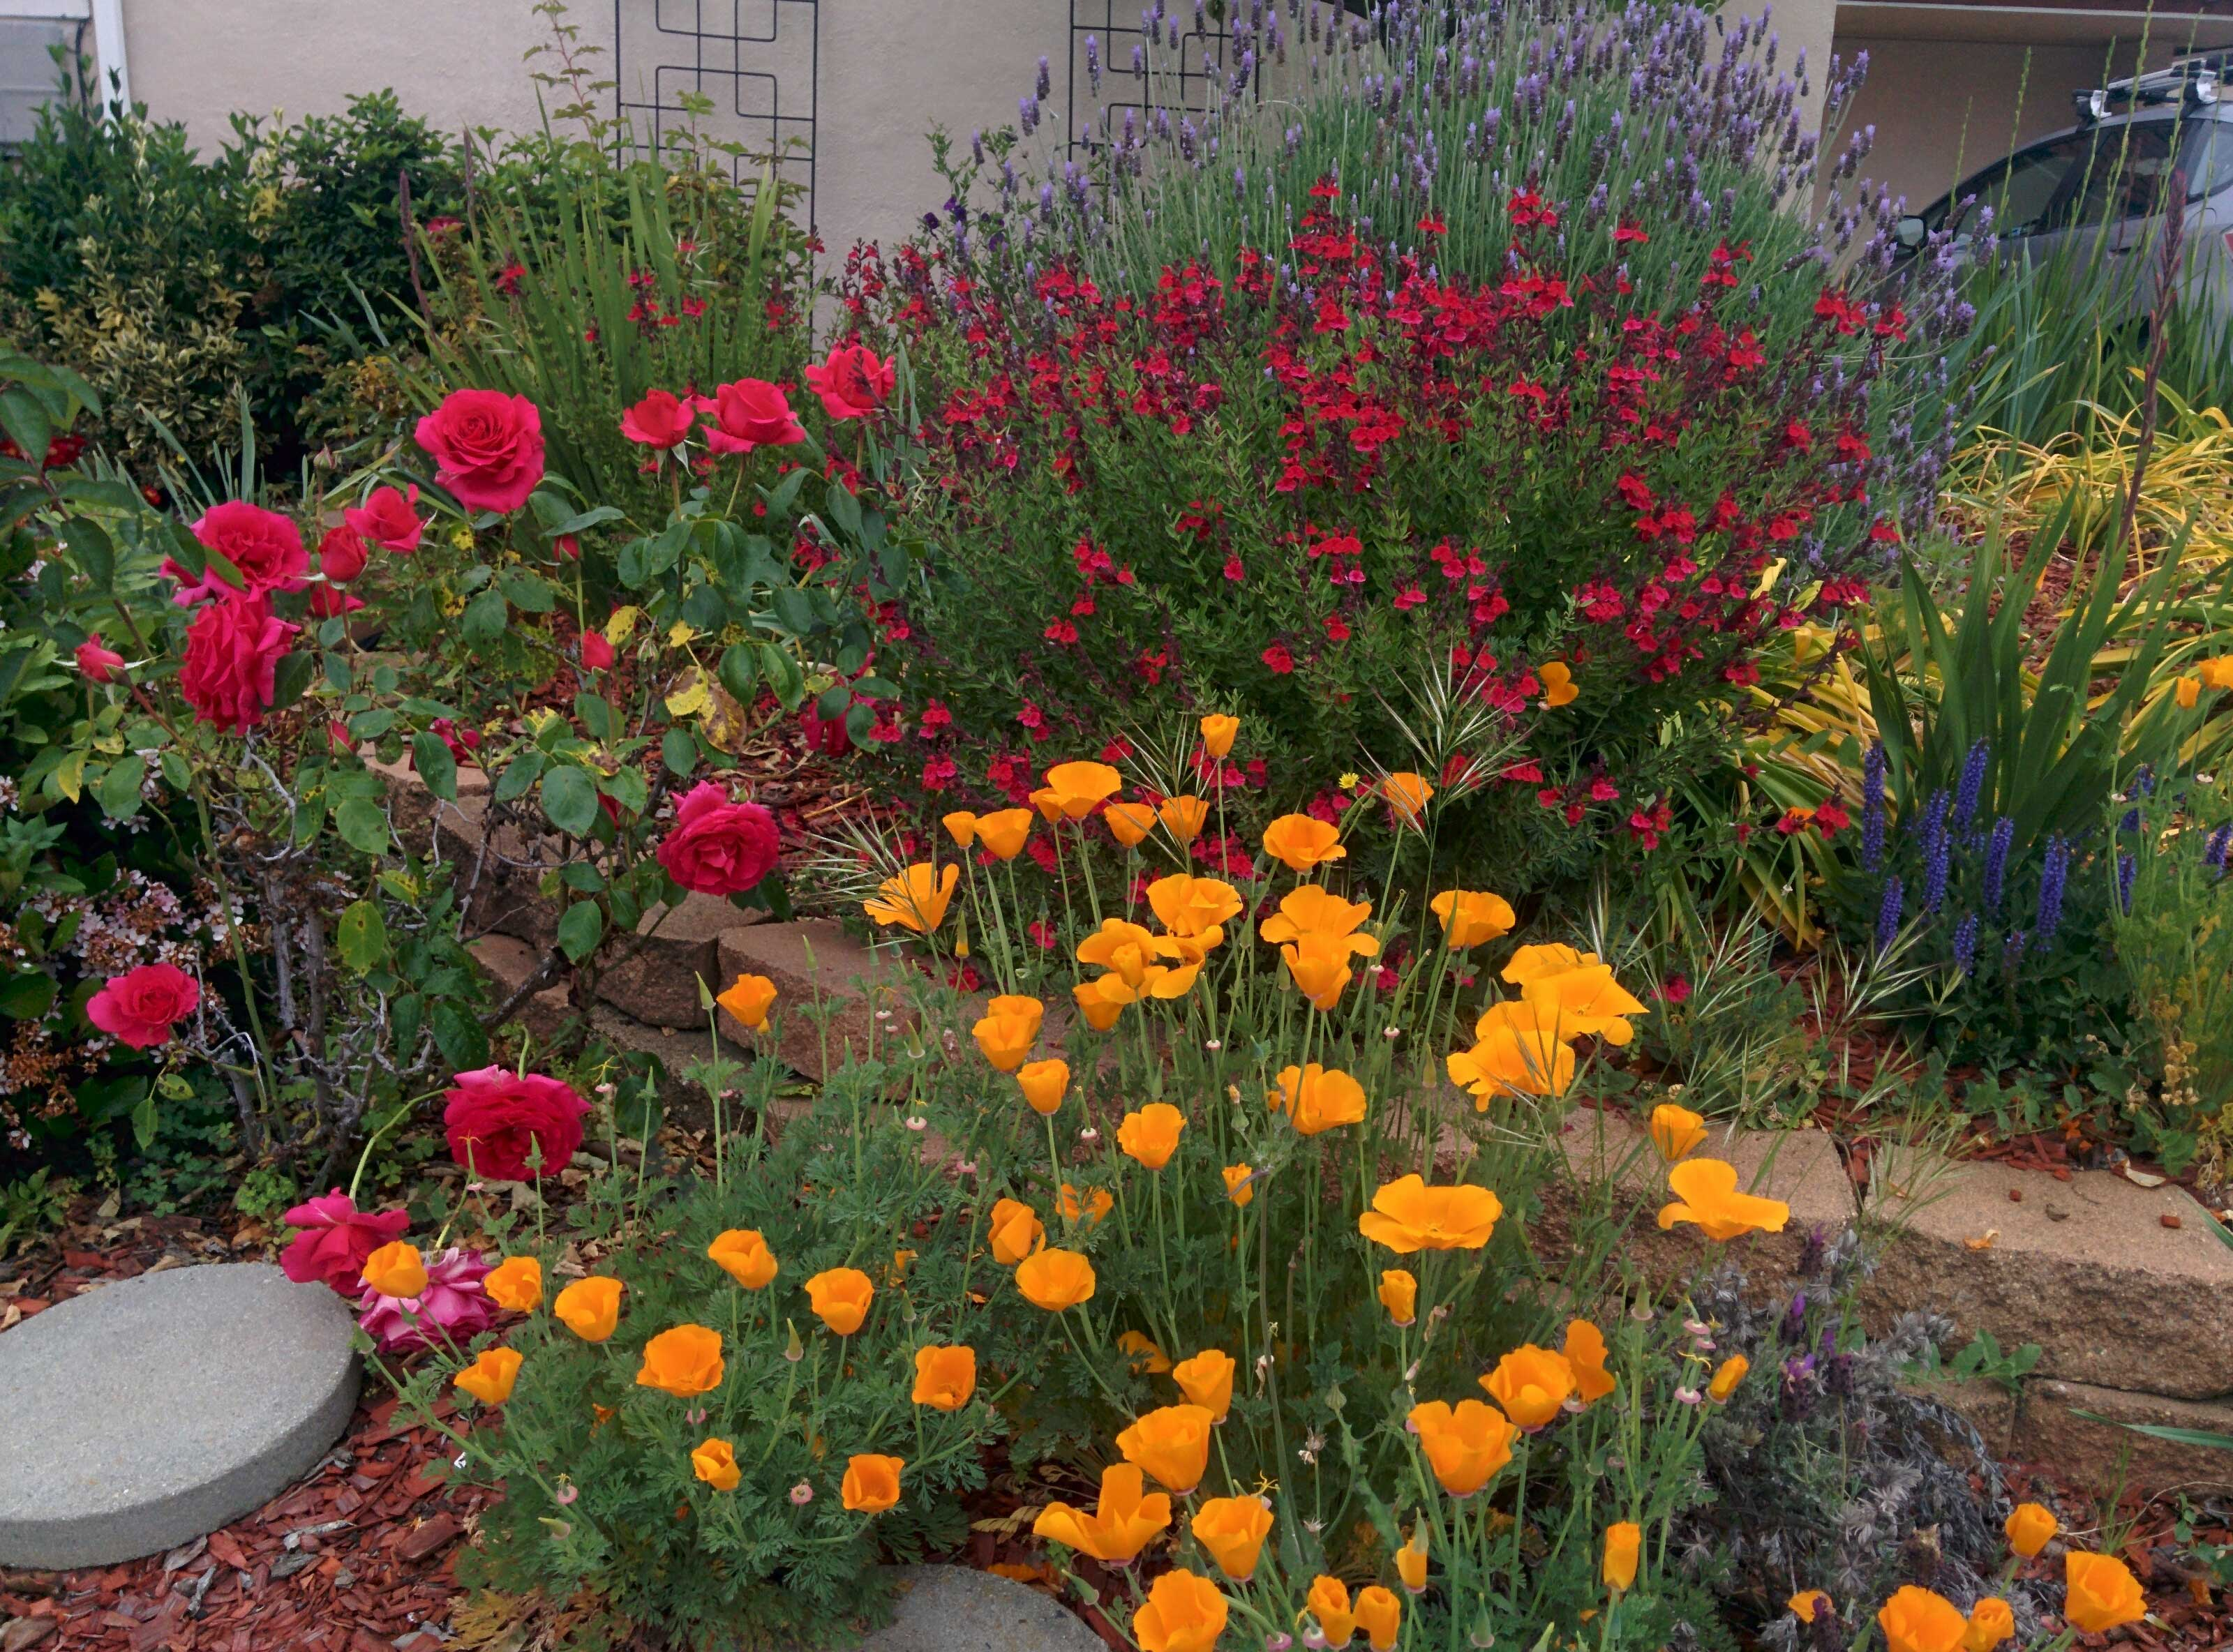 This Sunnyvale Garden – May 2016 | Sunnyvale Garden